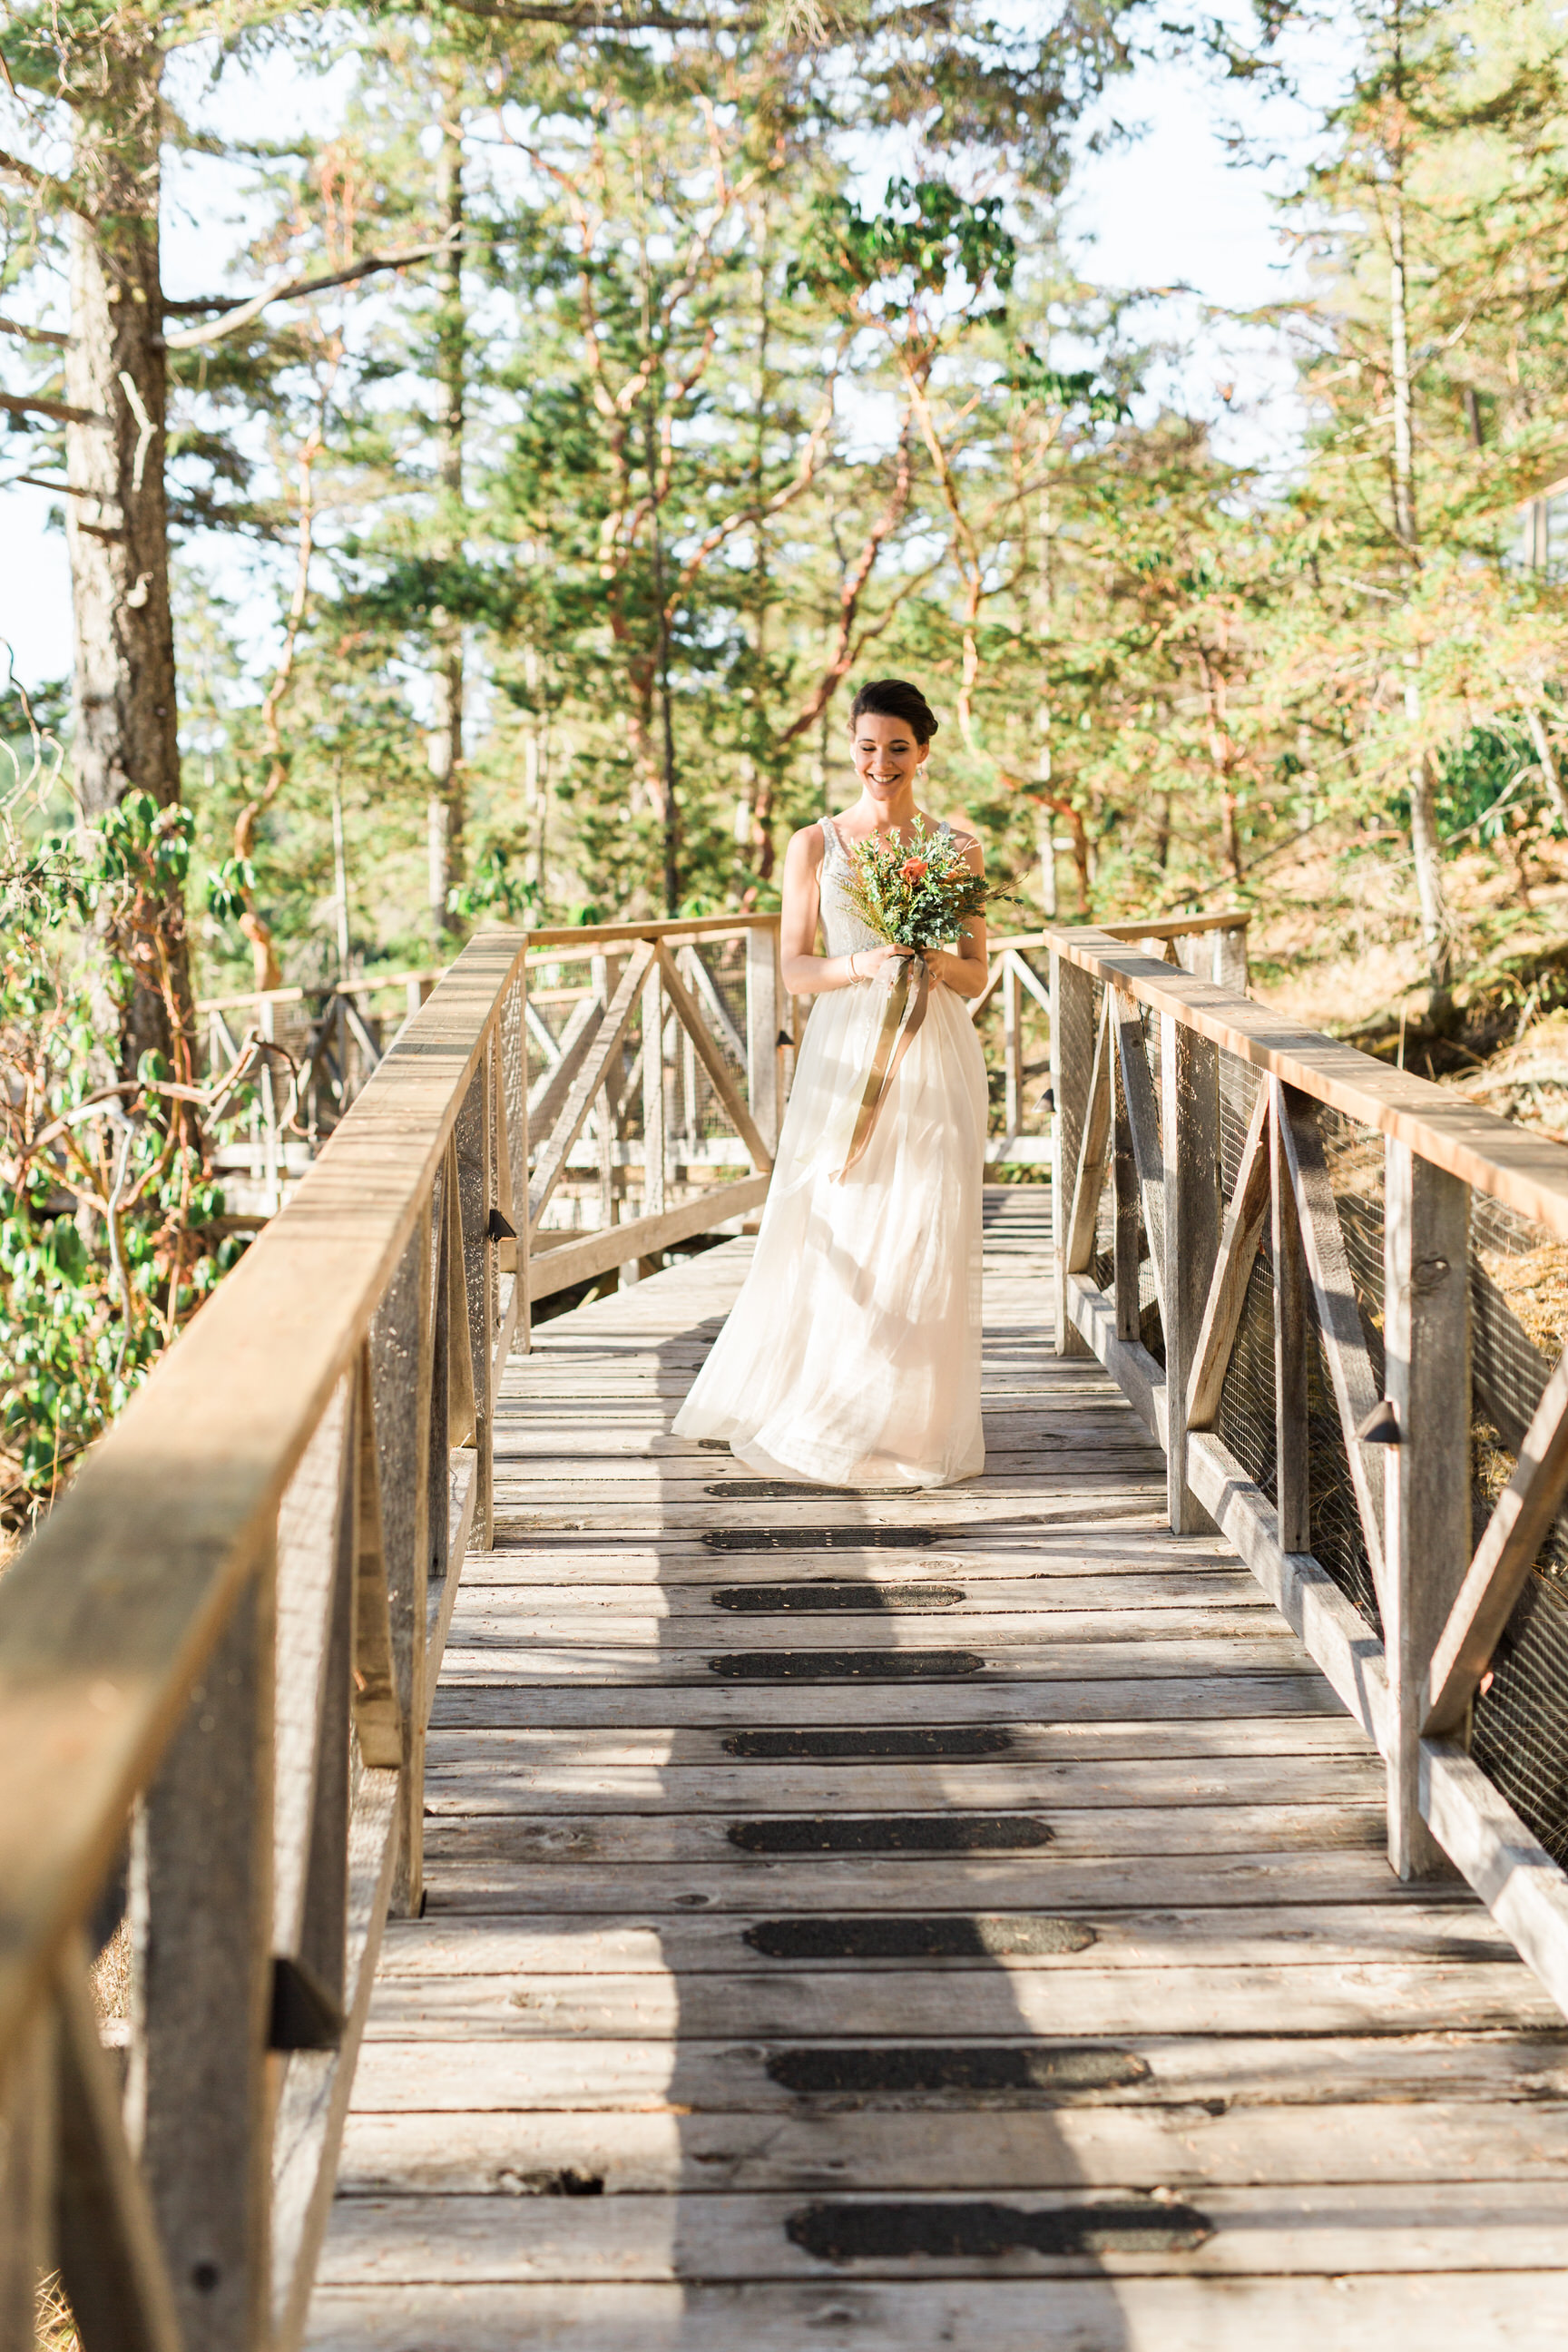 Rockwater Secret Cove Resort Wedding - Sunshine Coast BC Wedding Photographer - Vancouver Wedding Photographer - Sunshine Coast Elopement Photos - IMG_0184.jpg